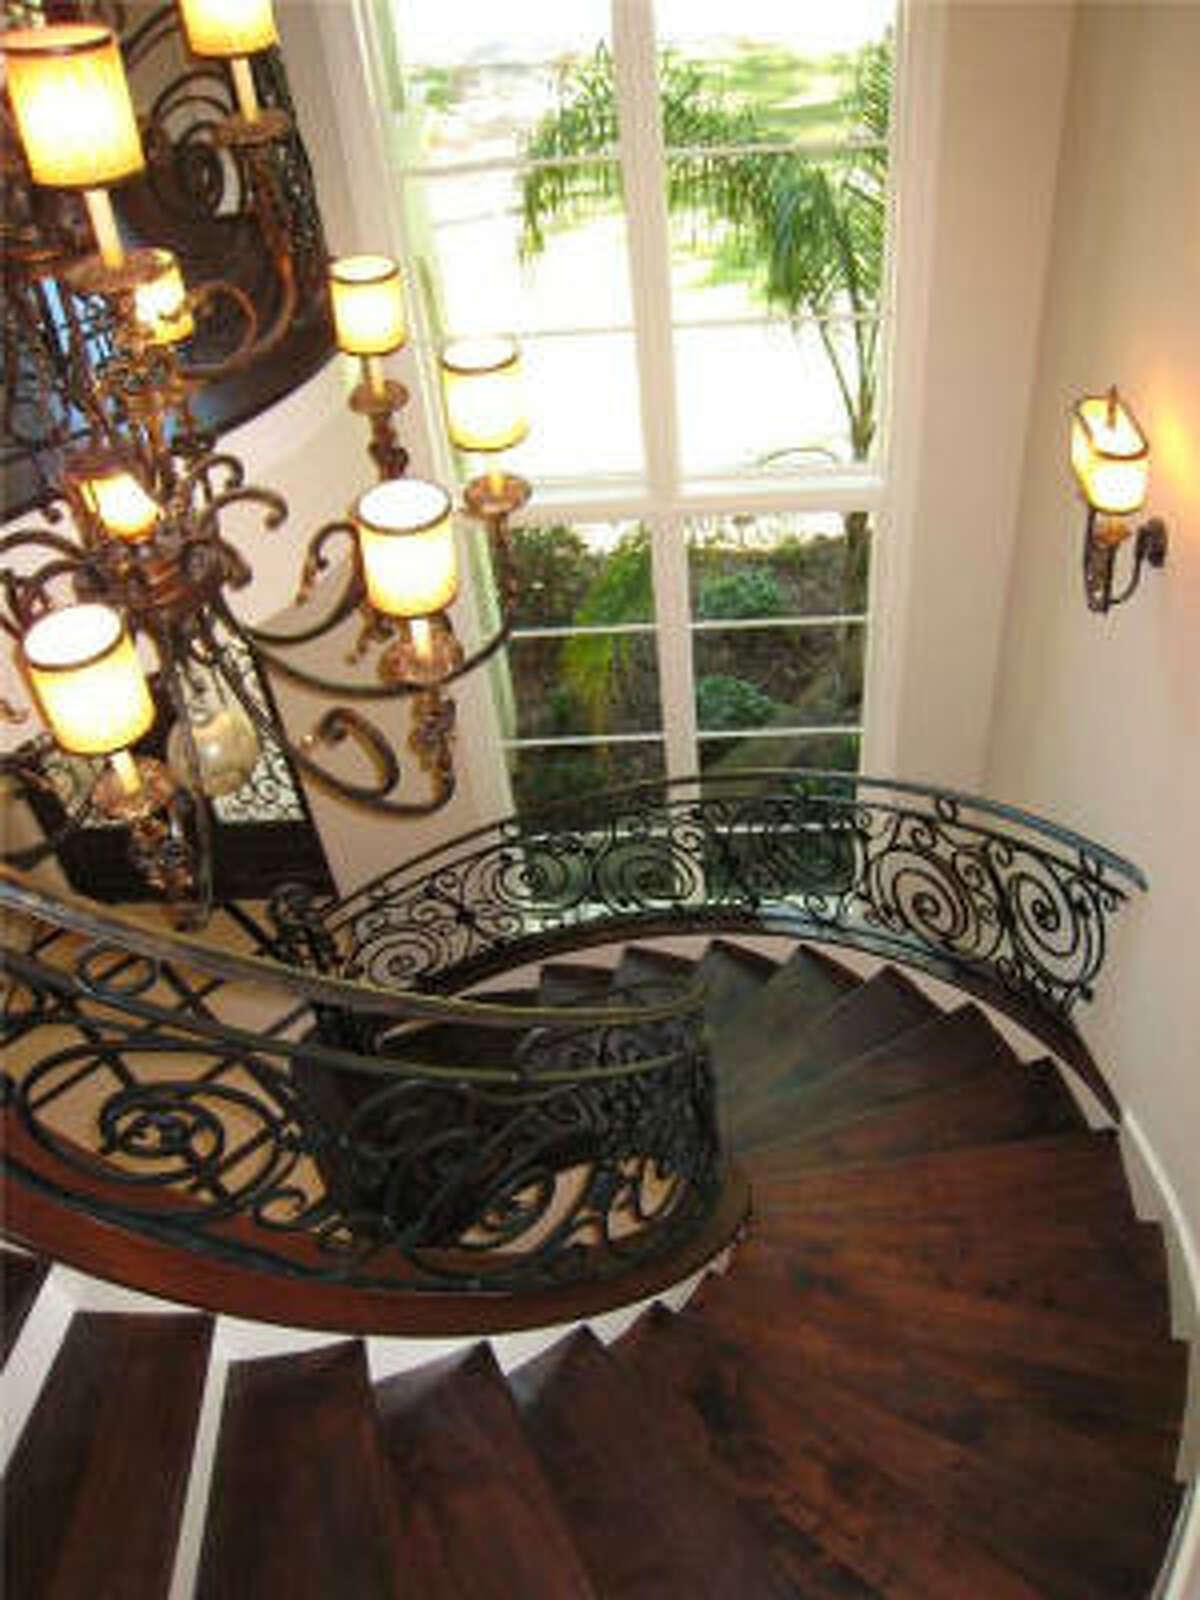 310 Tynebridge, $2,695,000 Agent: Patti Garrison Martha Turner Properties (713) 520-1981 Main